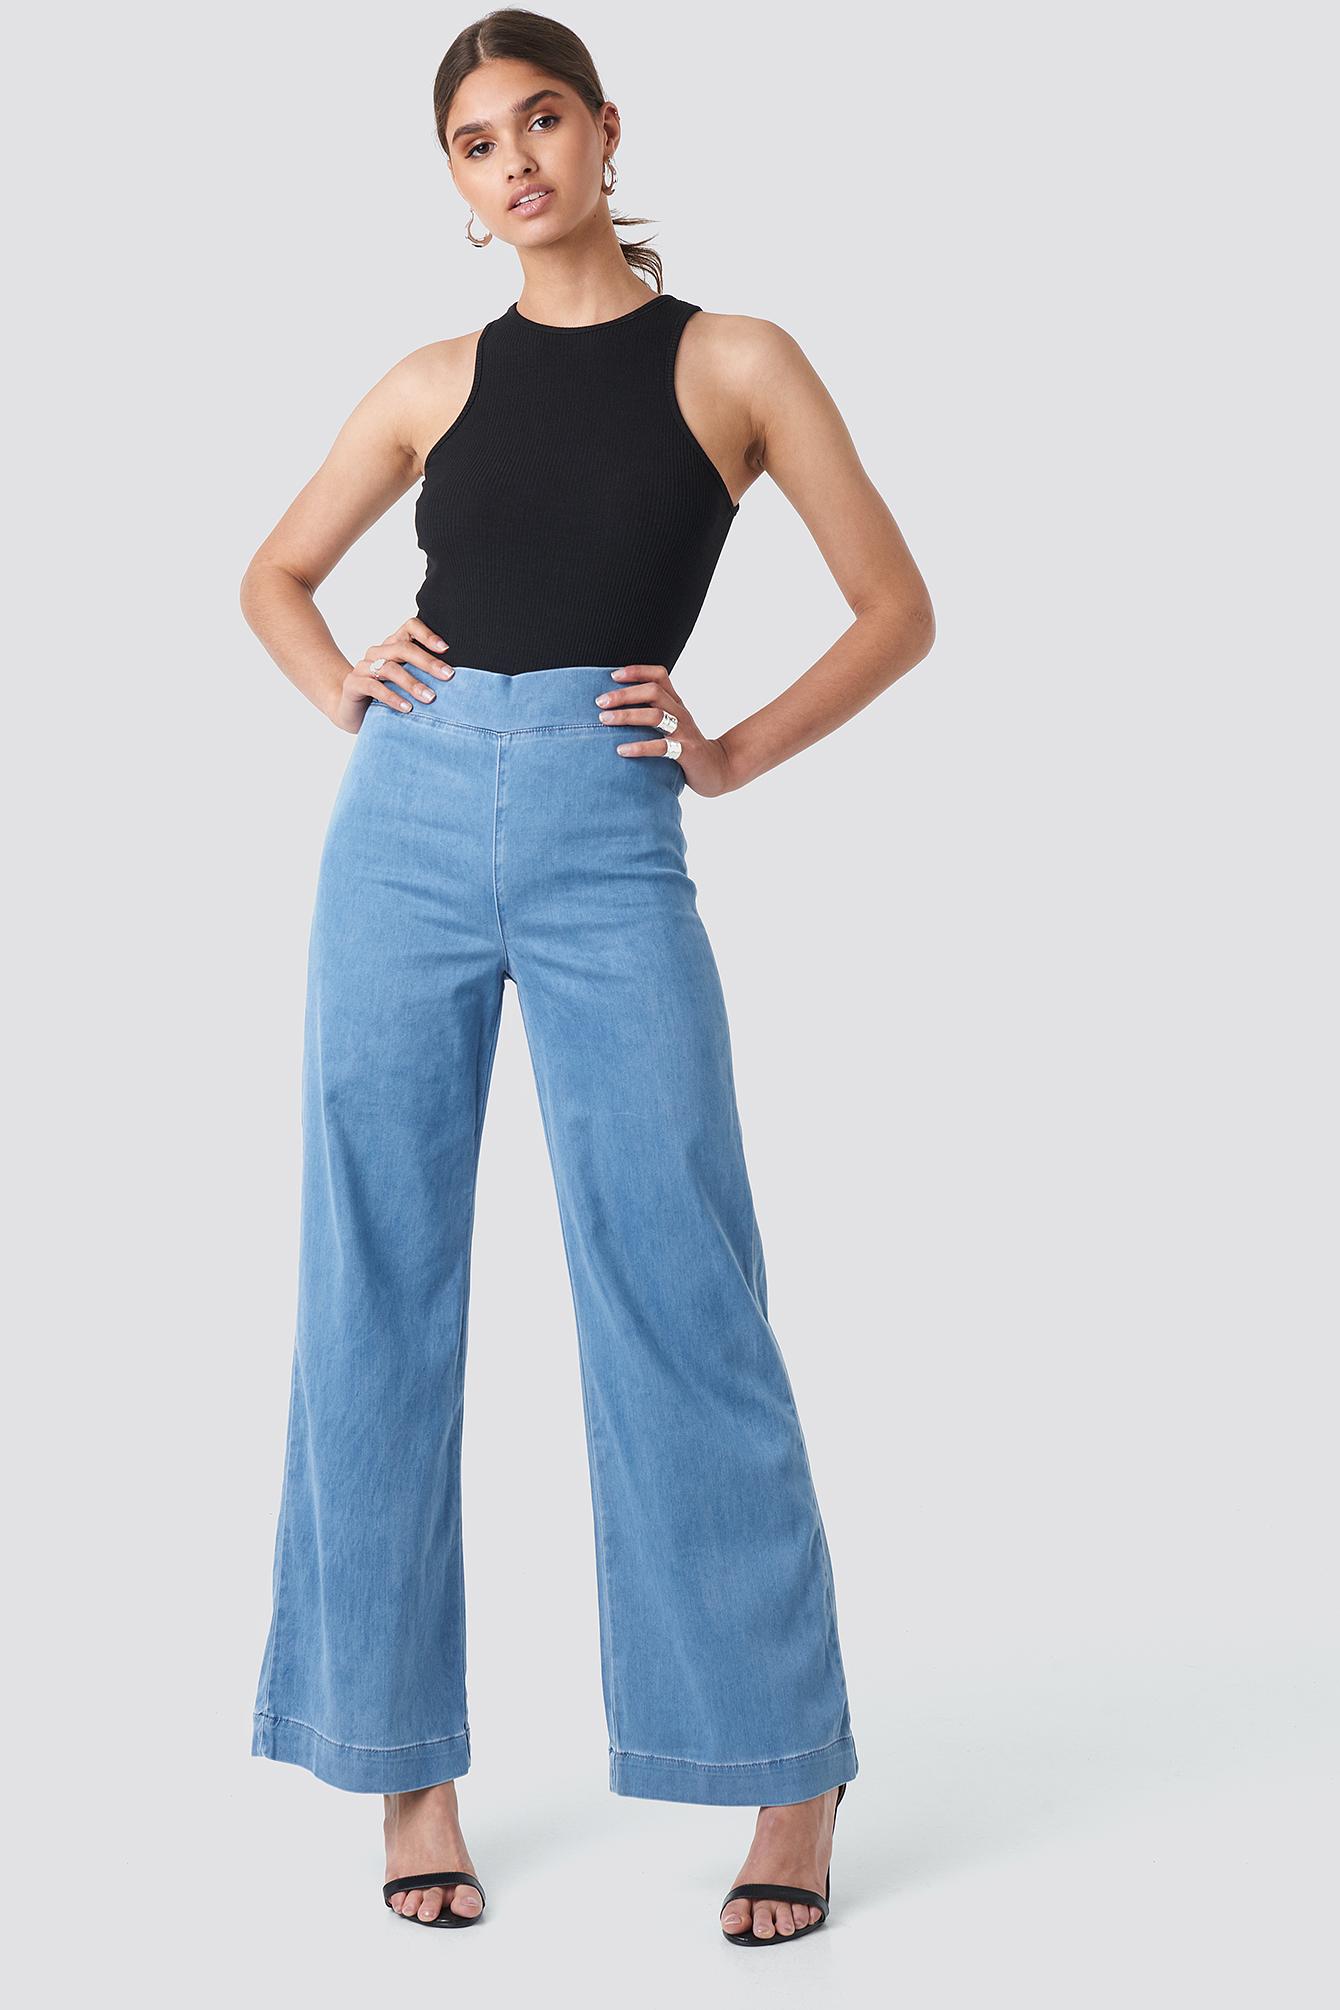 trendyol -  High Waist Wide Leg Jeans - Blue